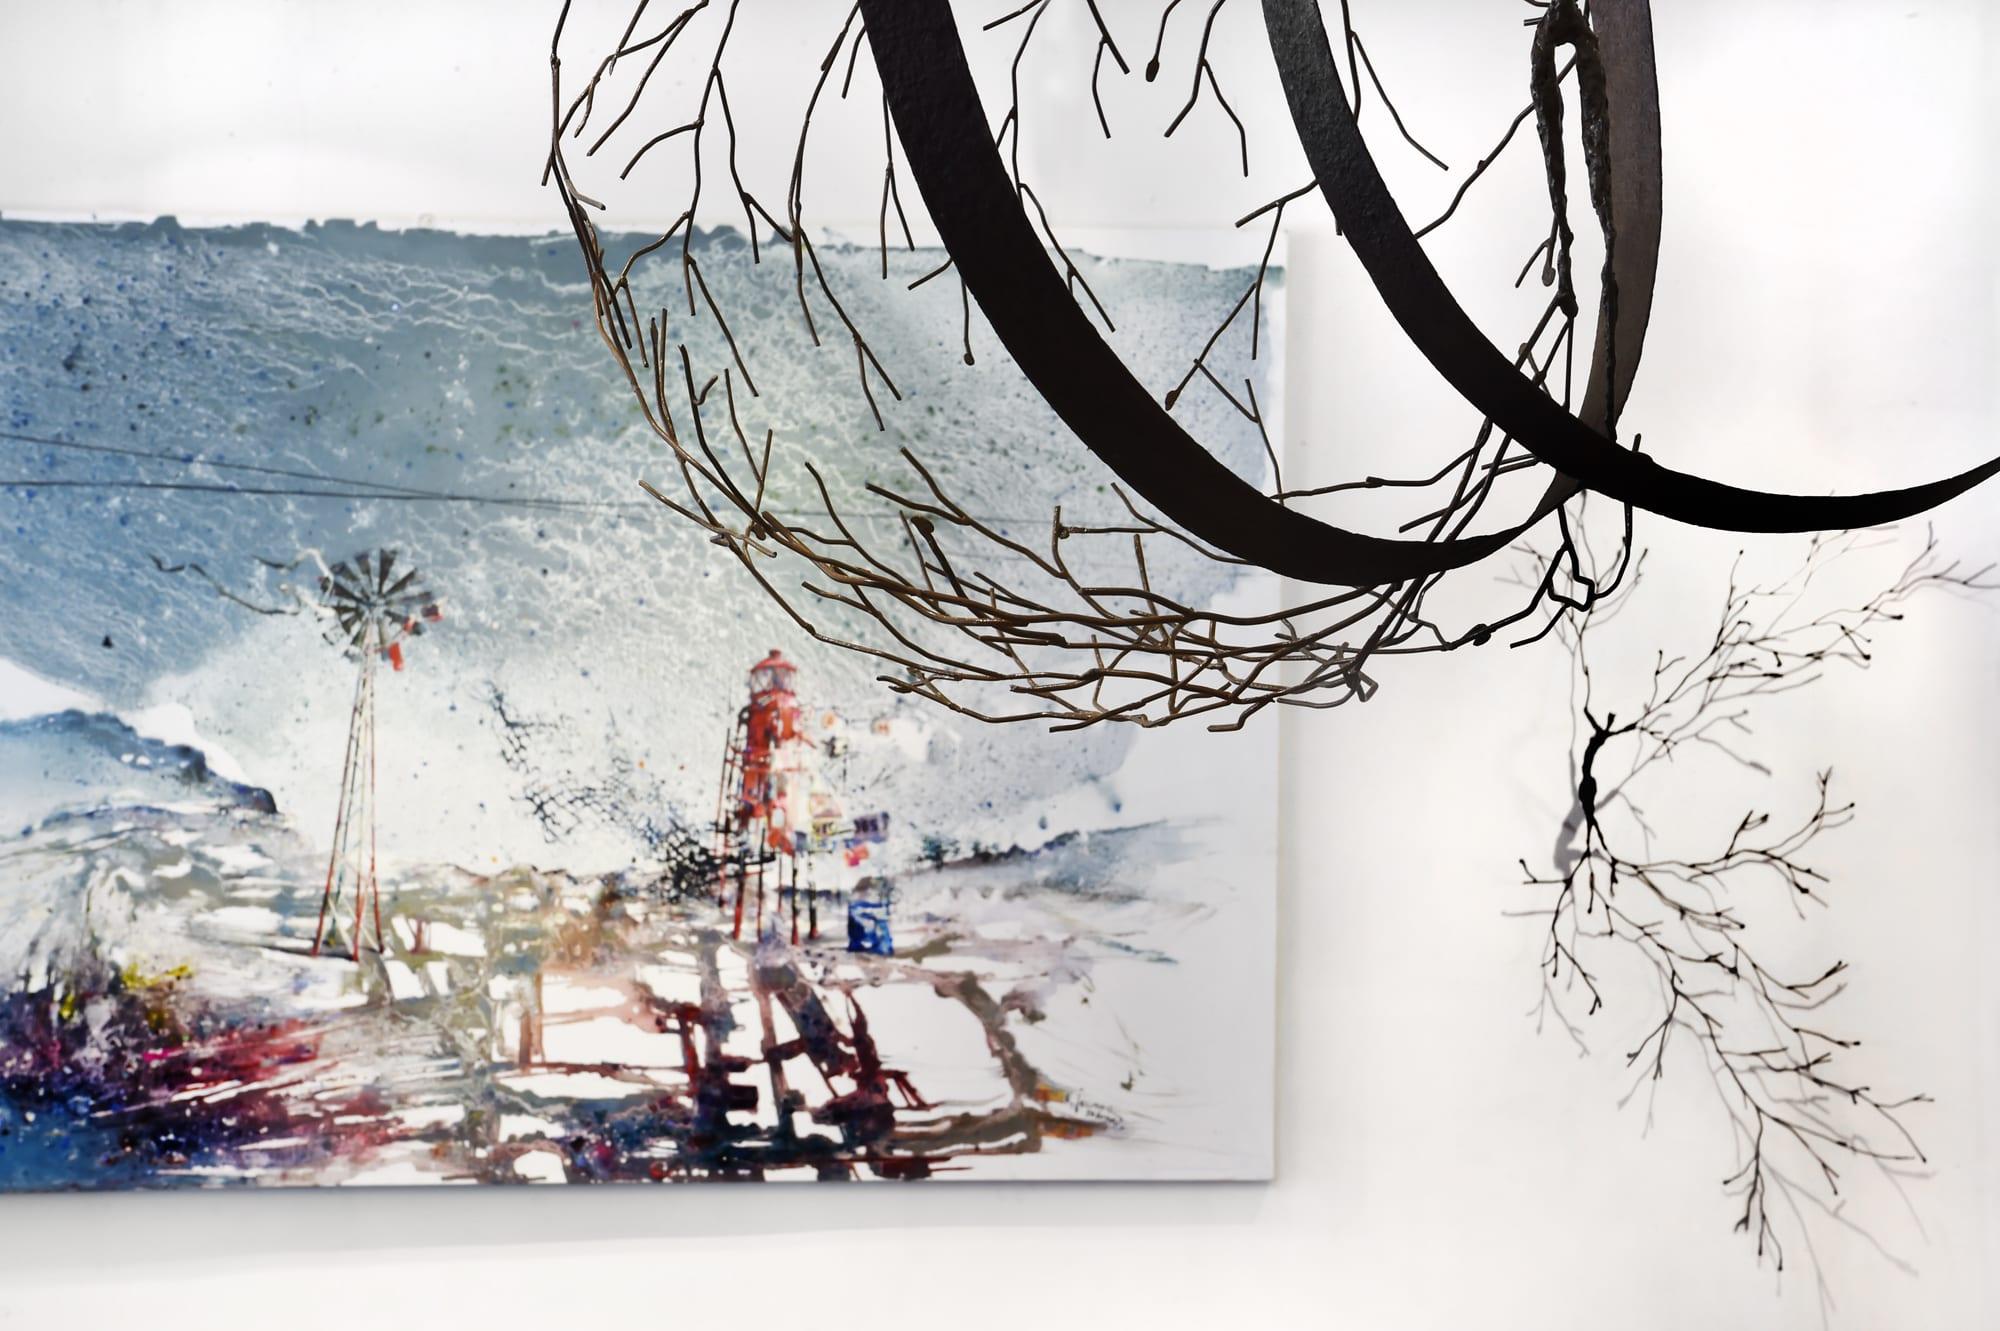 Accrochage des artistes permanents  - Exposition collective